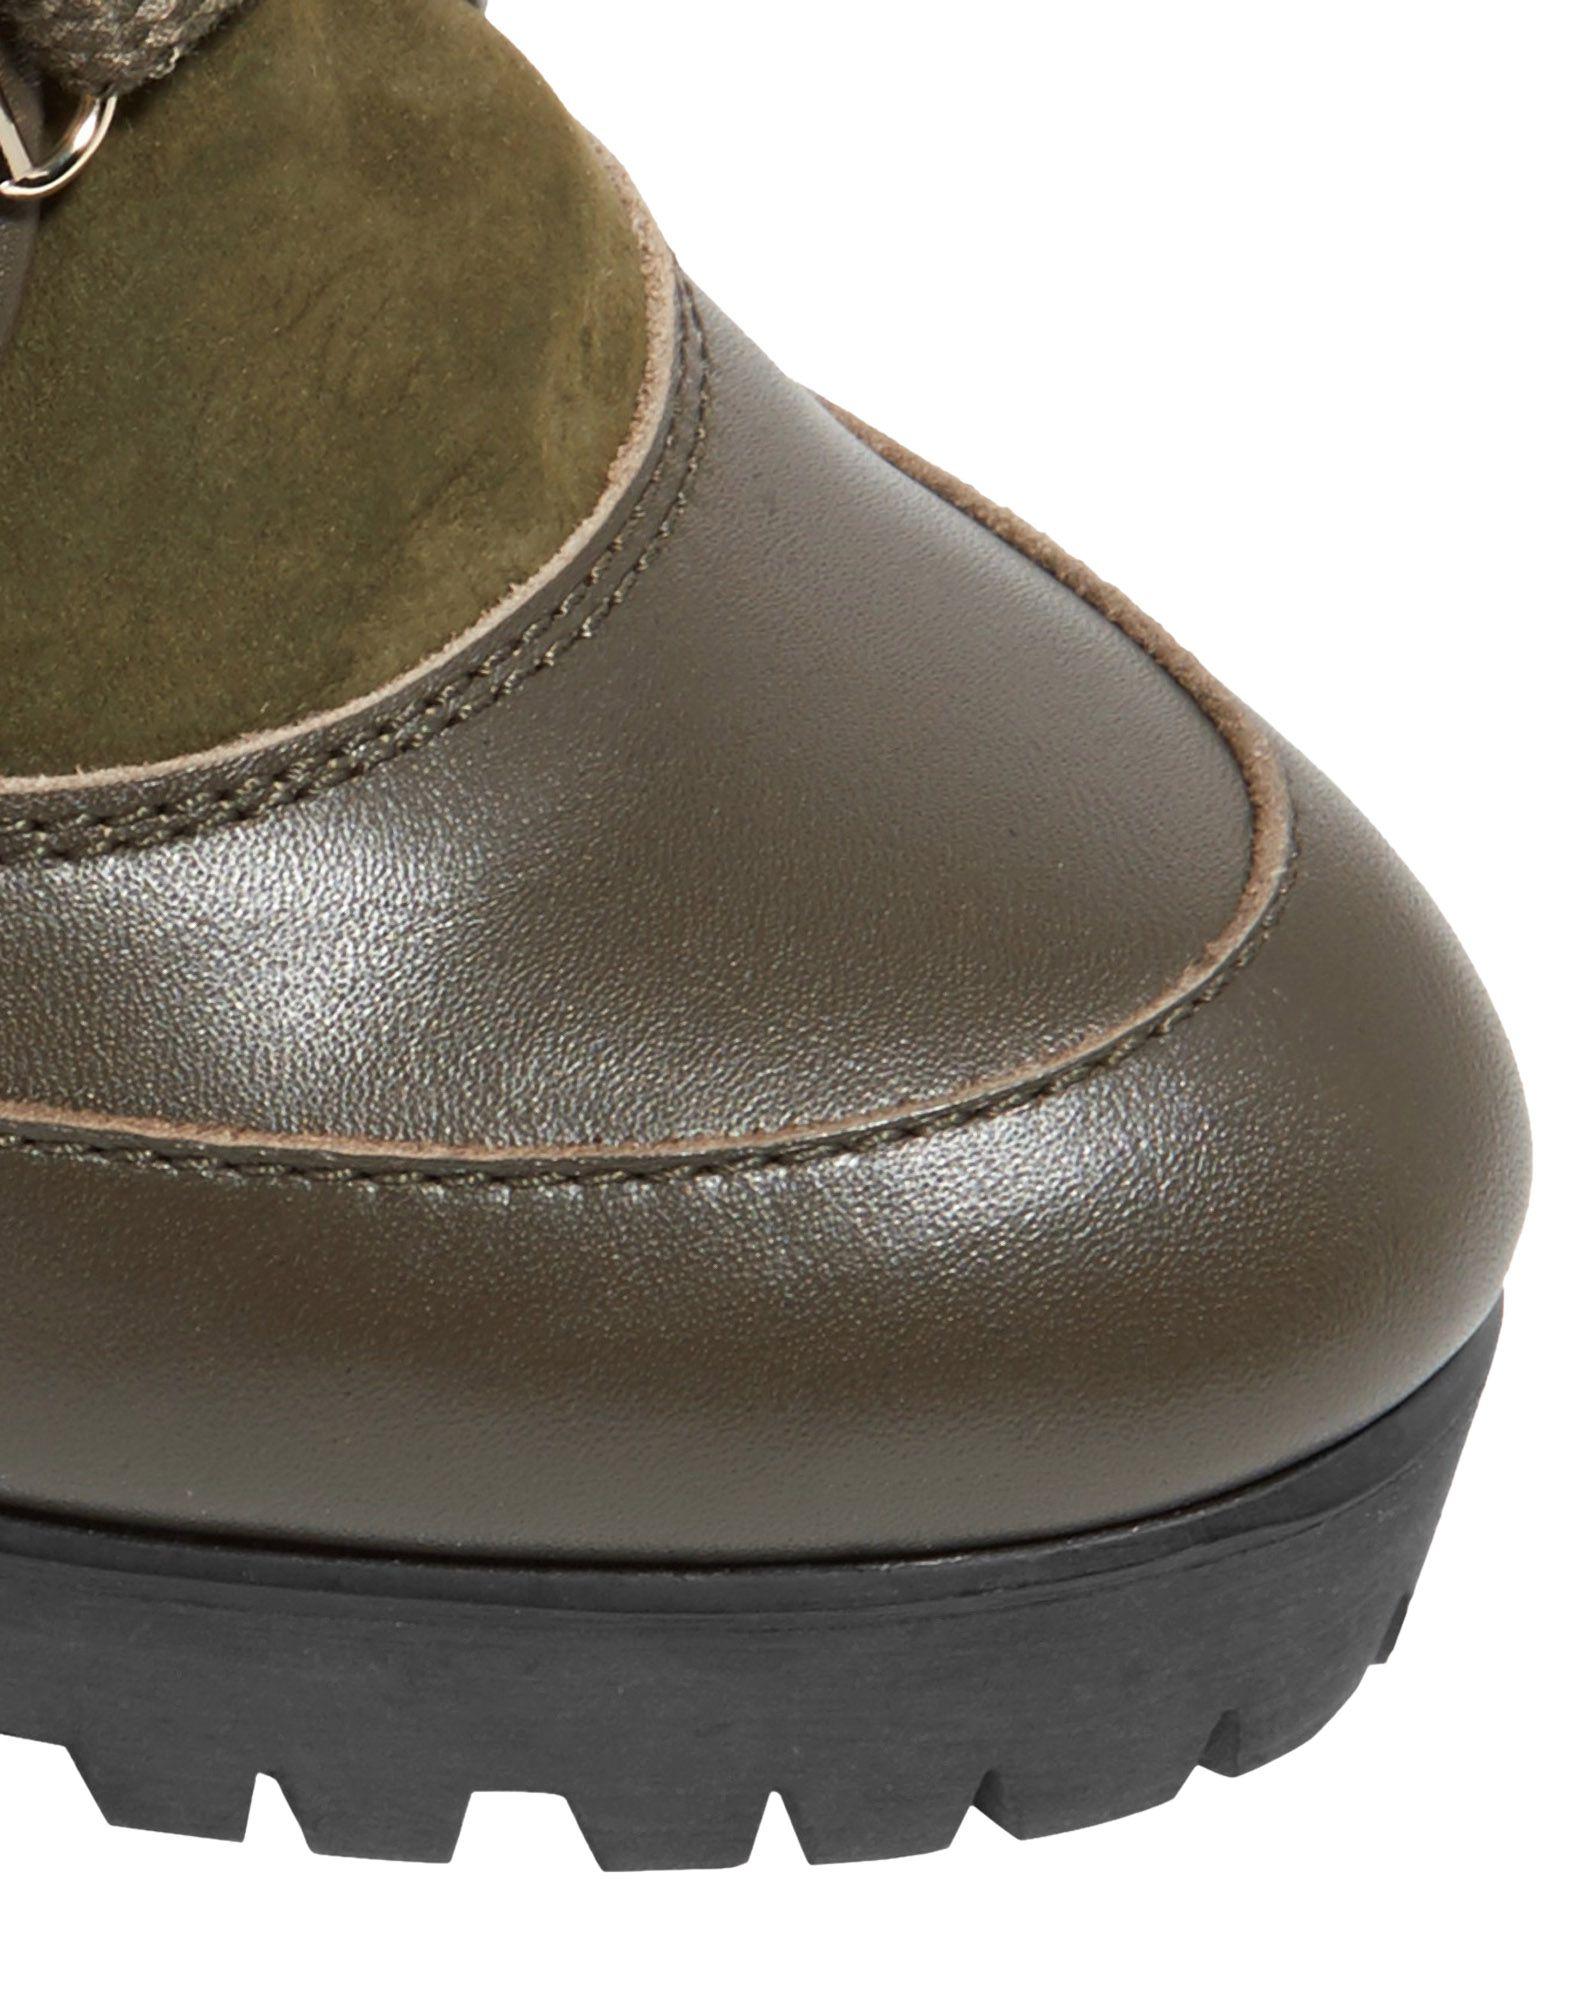 Rabatt Rabatt Rabatt Schuhe ROT(V) Stiefelette Damen 11222351QE 2c8814